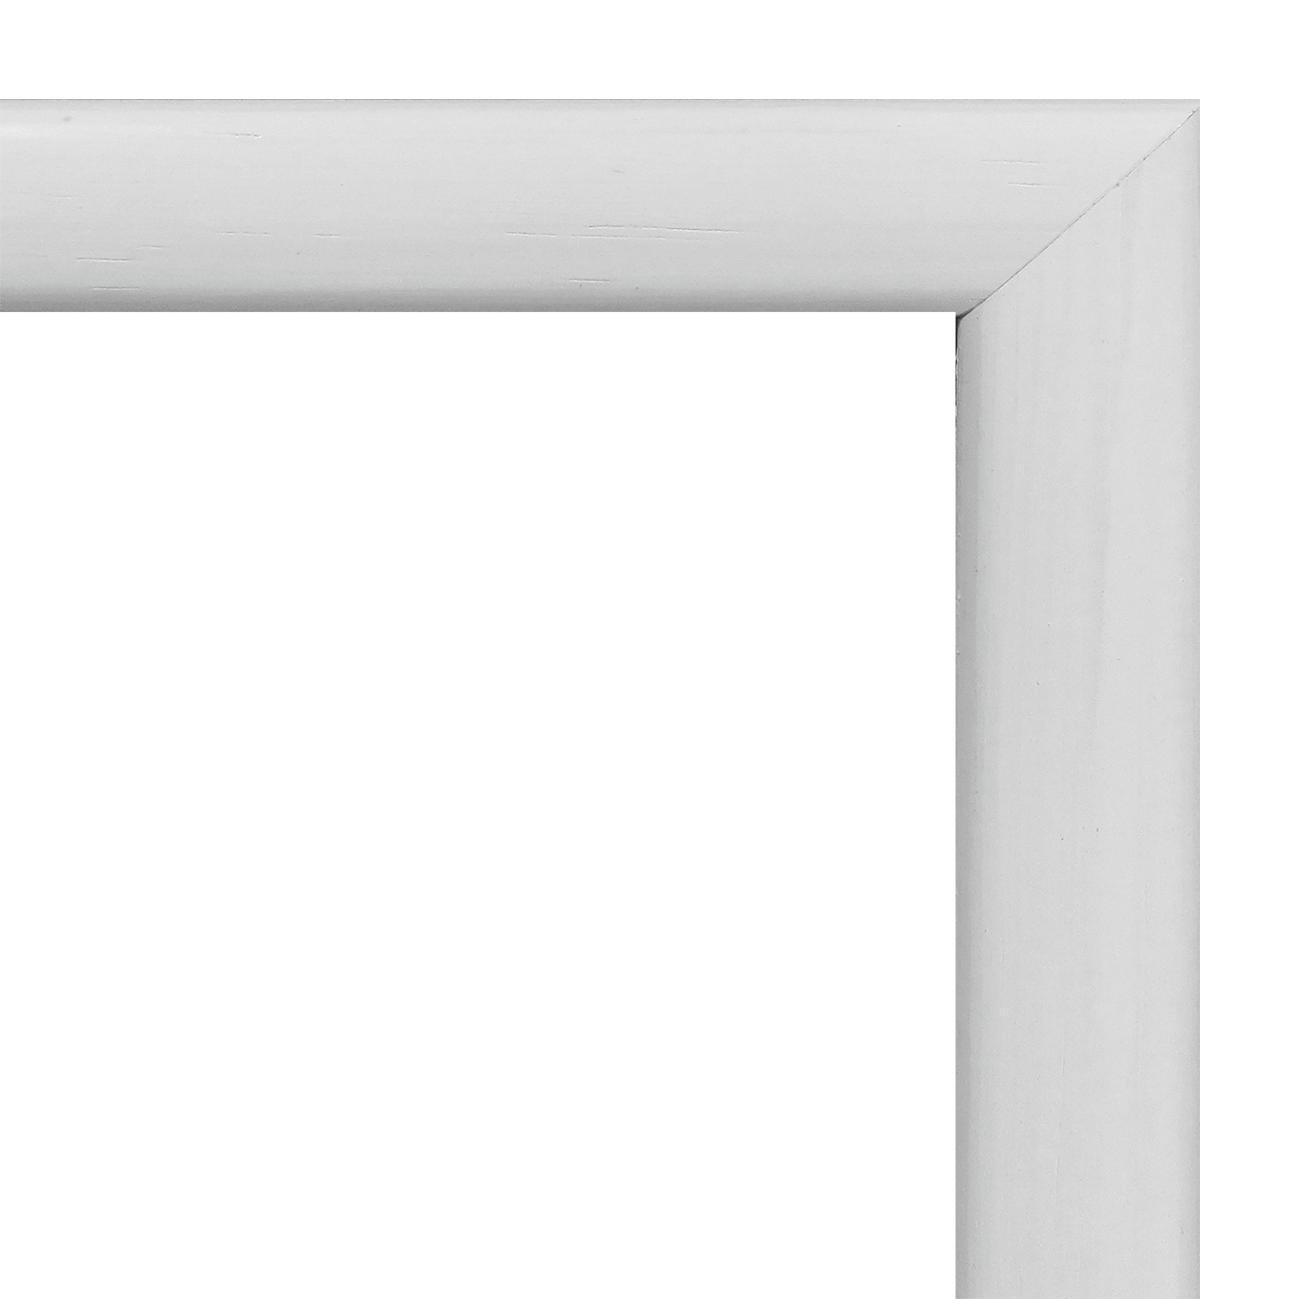 Cornice INSPIRE Pulp bianco per foto da 70x100 cm - 4